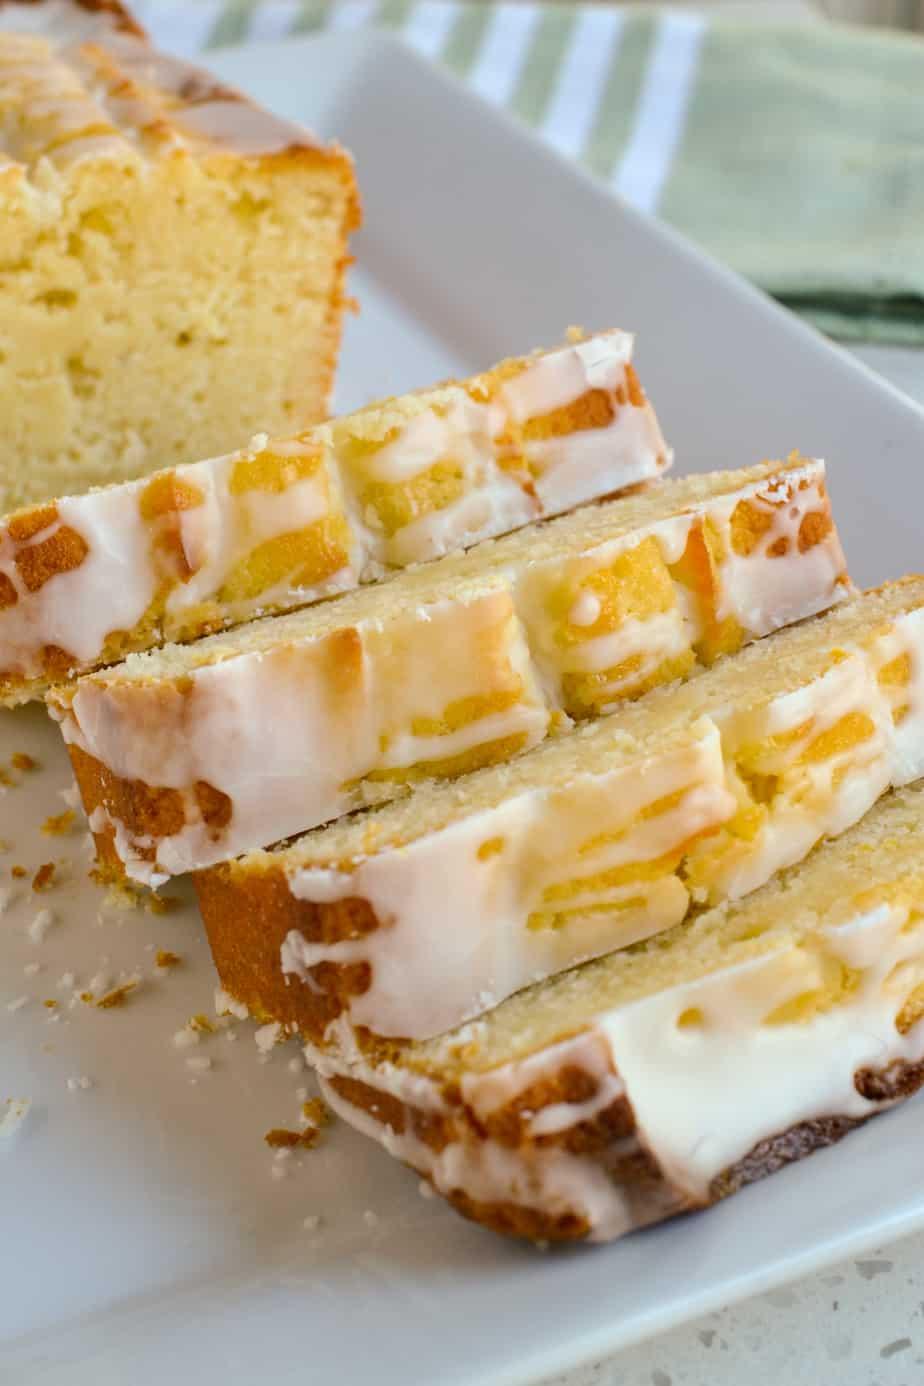 Slices of lemon glazed pound cake on a platter.